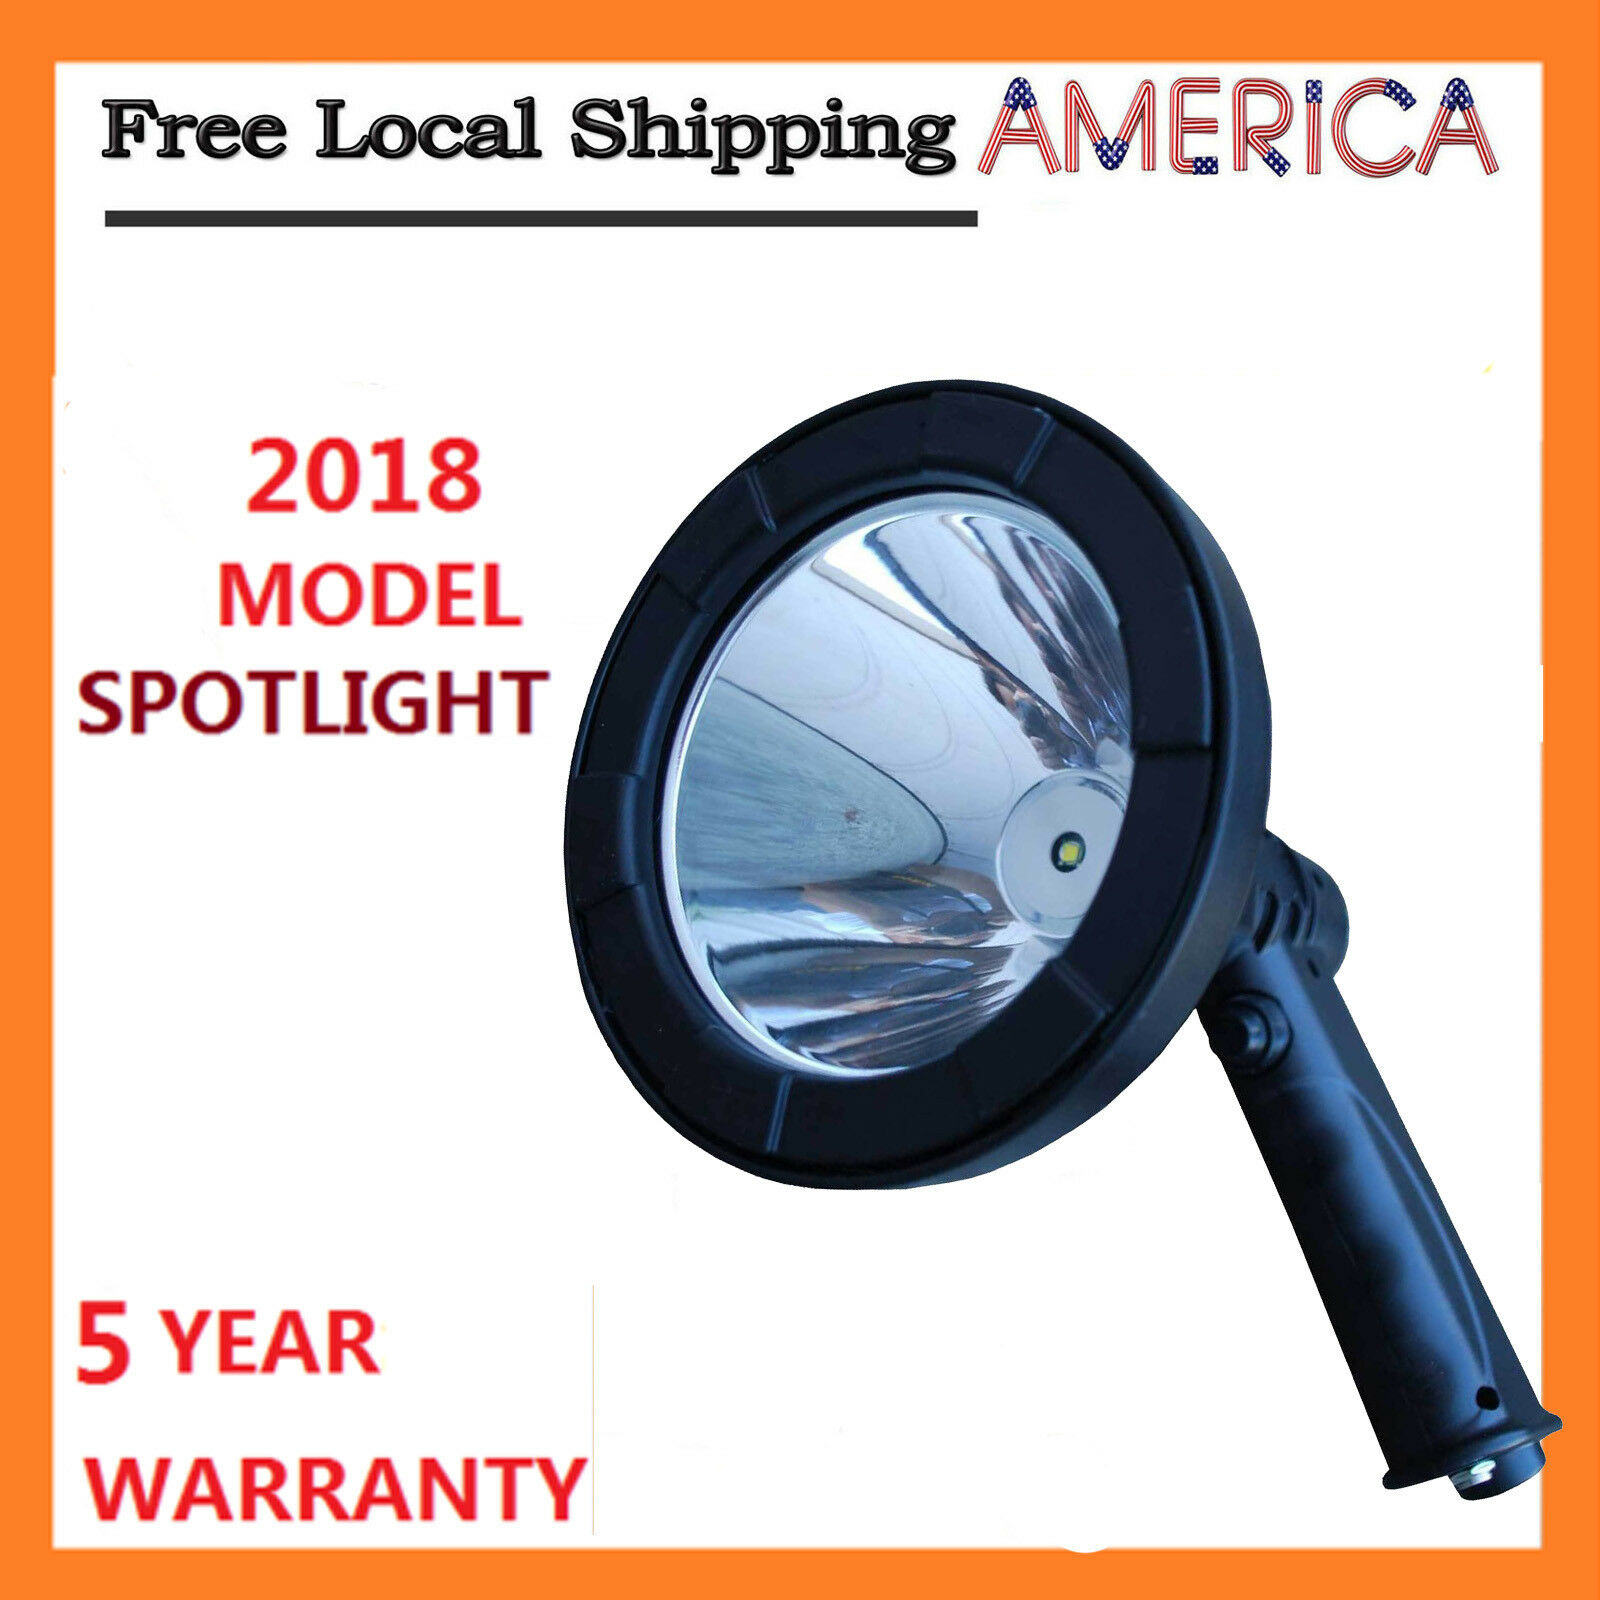 600W LED Cree 12v Rechargeable Spotlight Hunt Handheld Spot Light Camp Fish Lamp